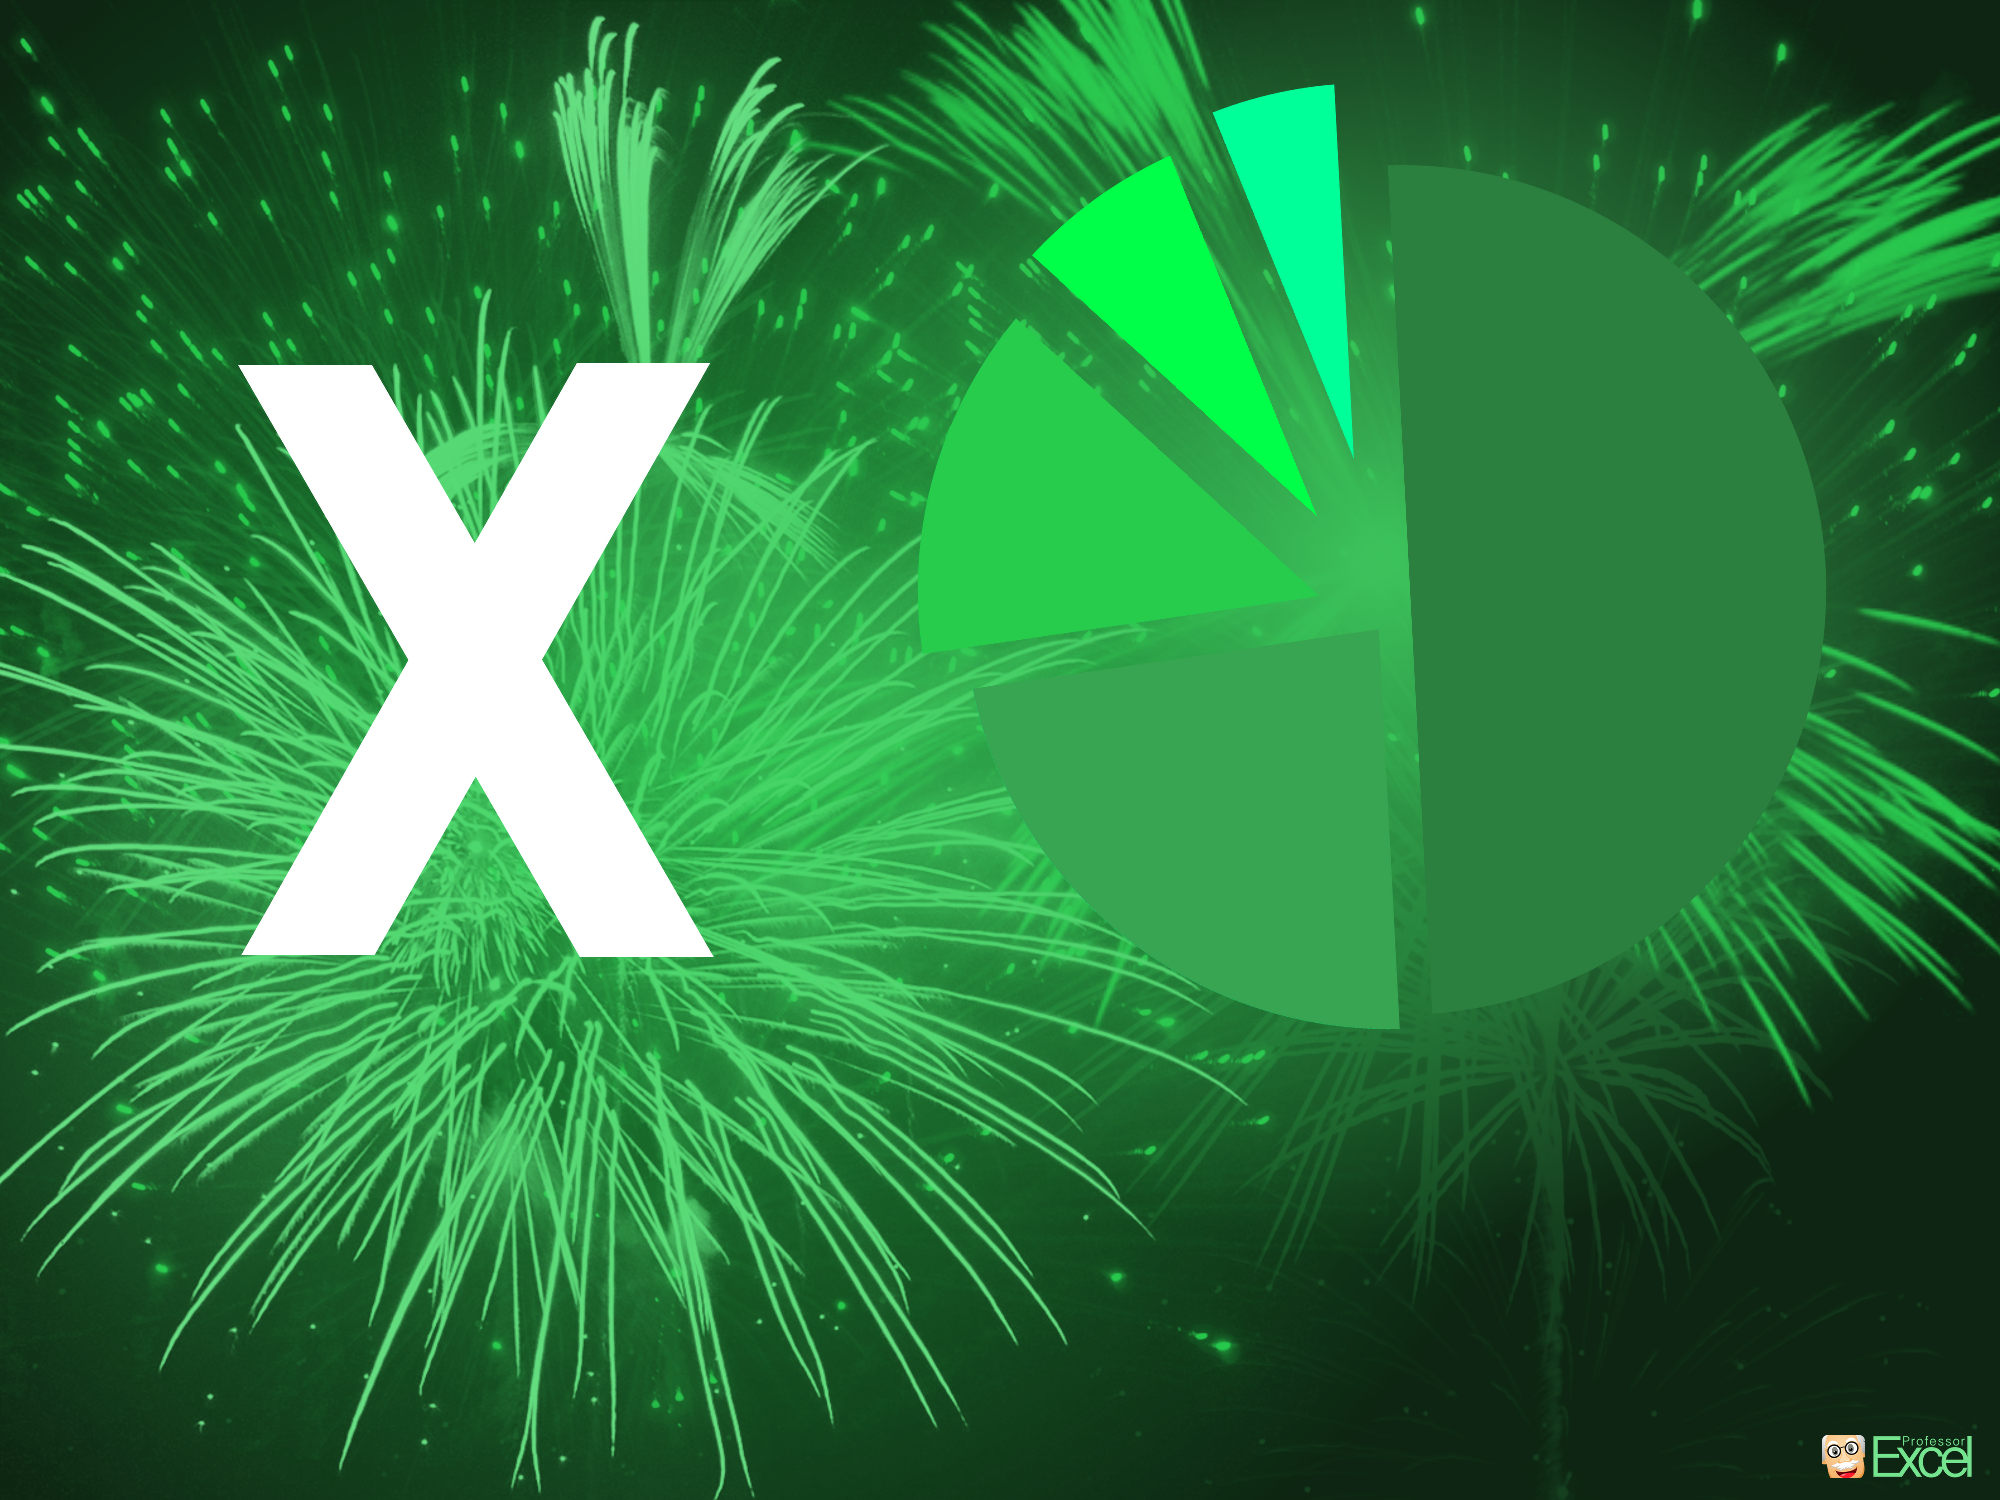 Excel Wallpaper for Download Professor Excel 2000x1500